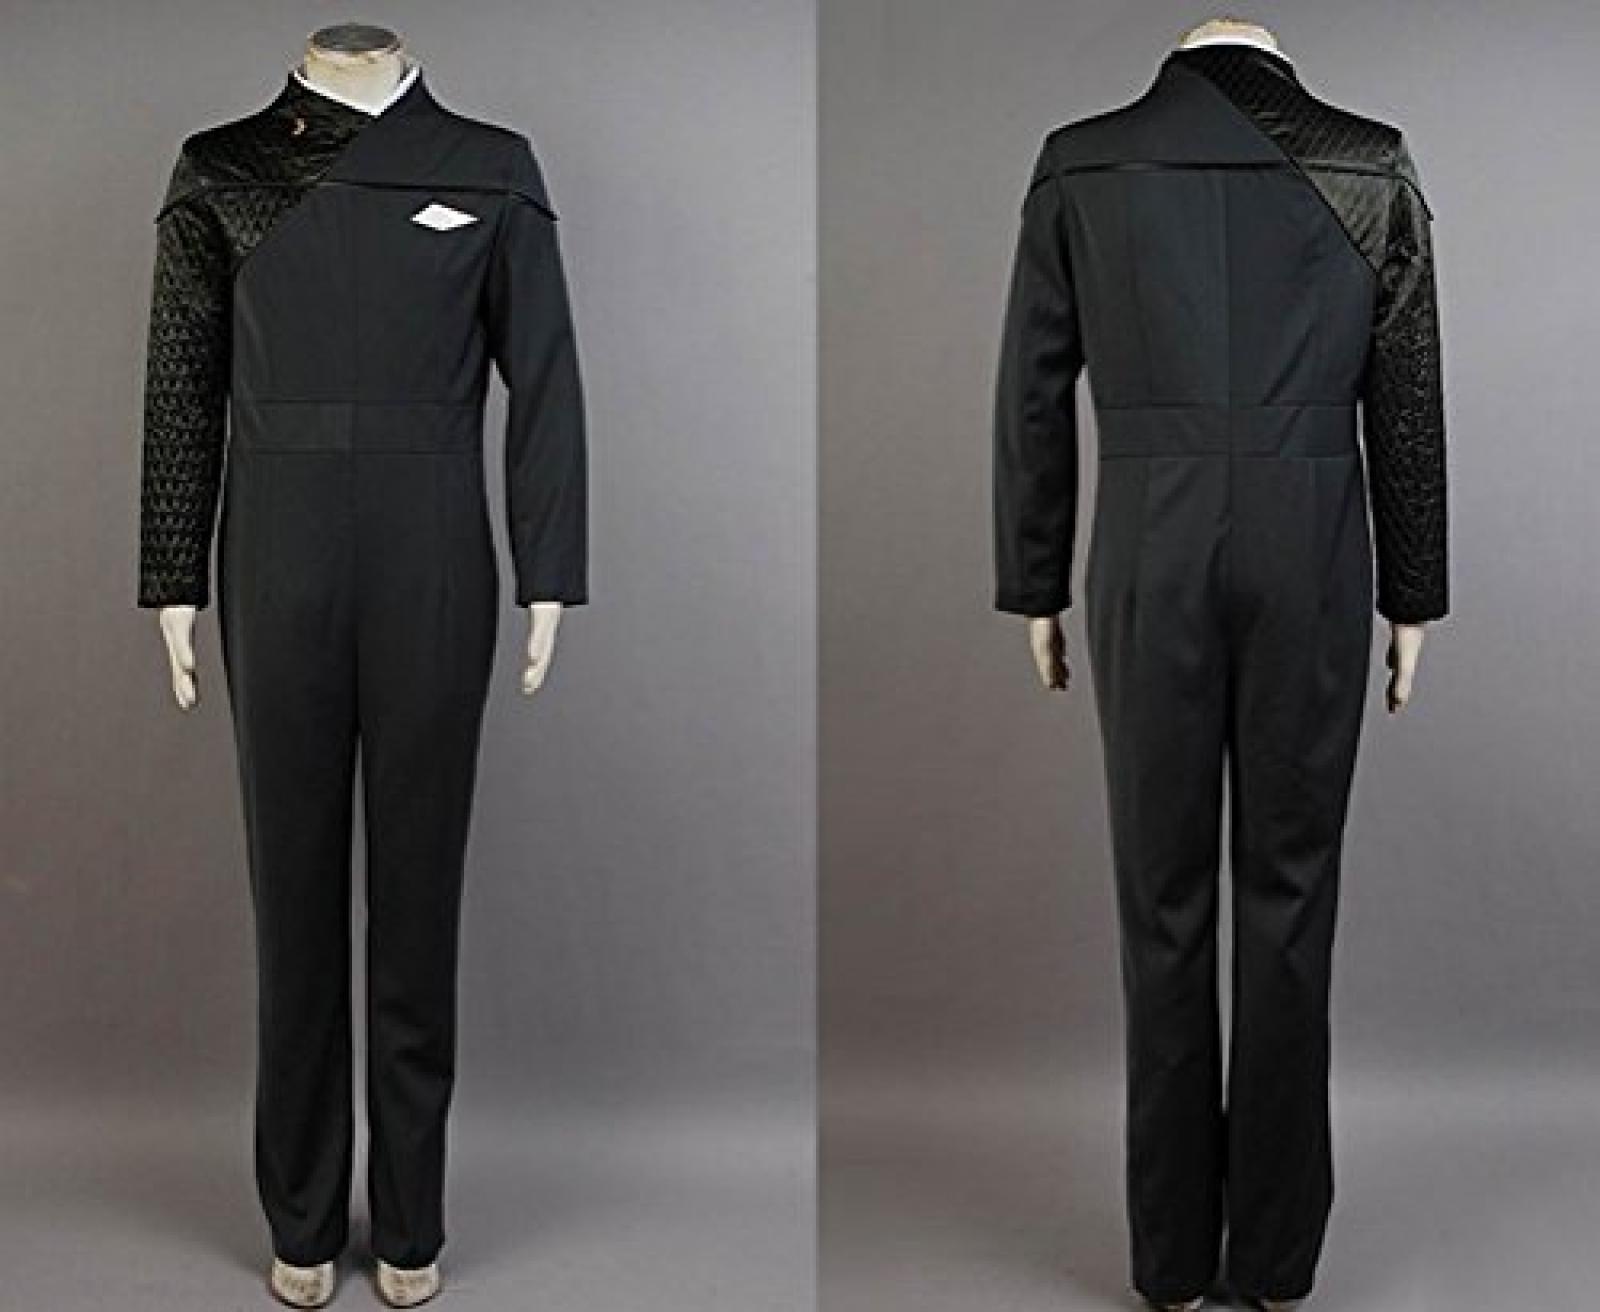 Star Trek: Voyager Relativity Starfleet 29th Century Science Cosplay Uniform Dunkel Gruen